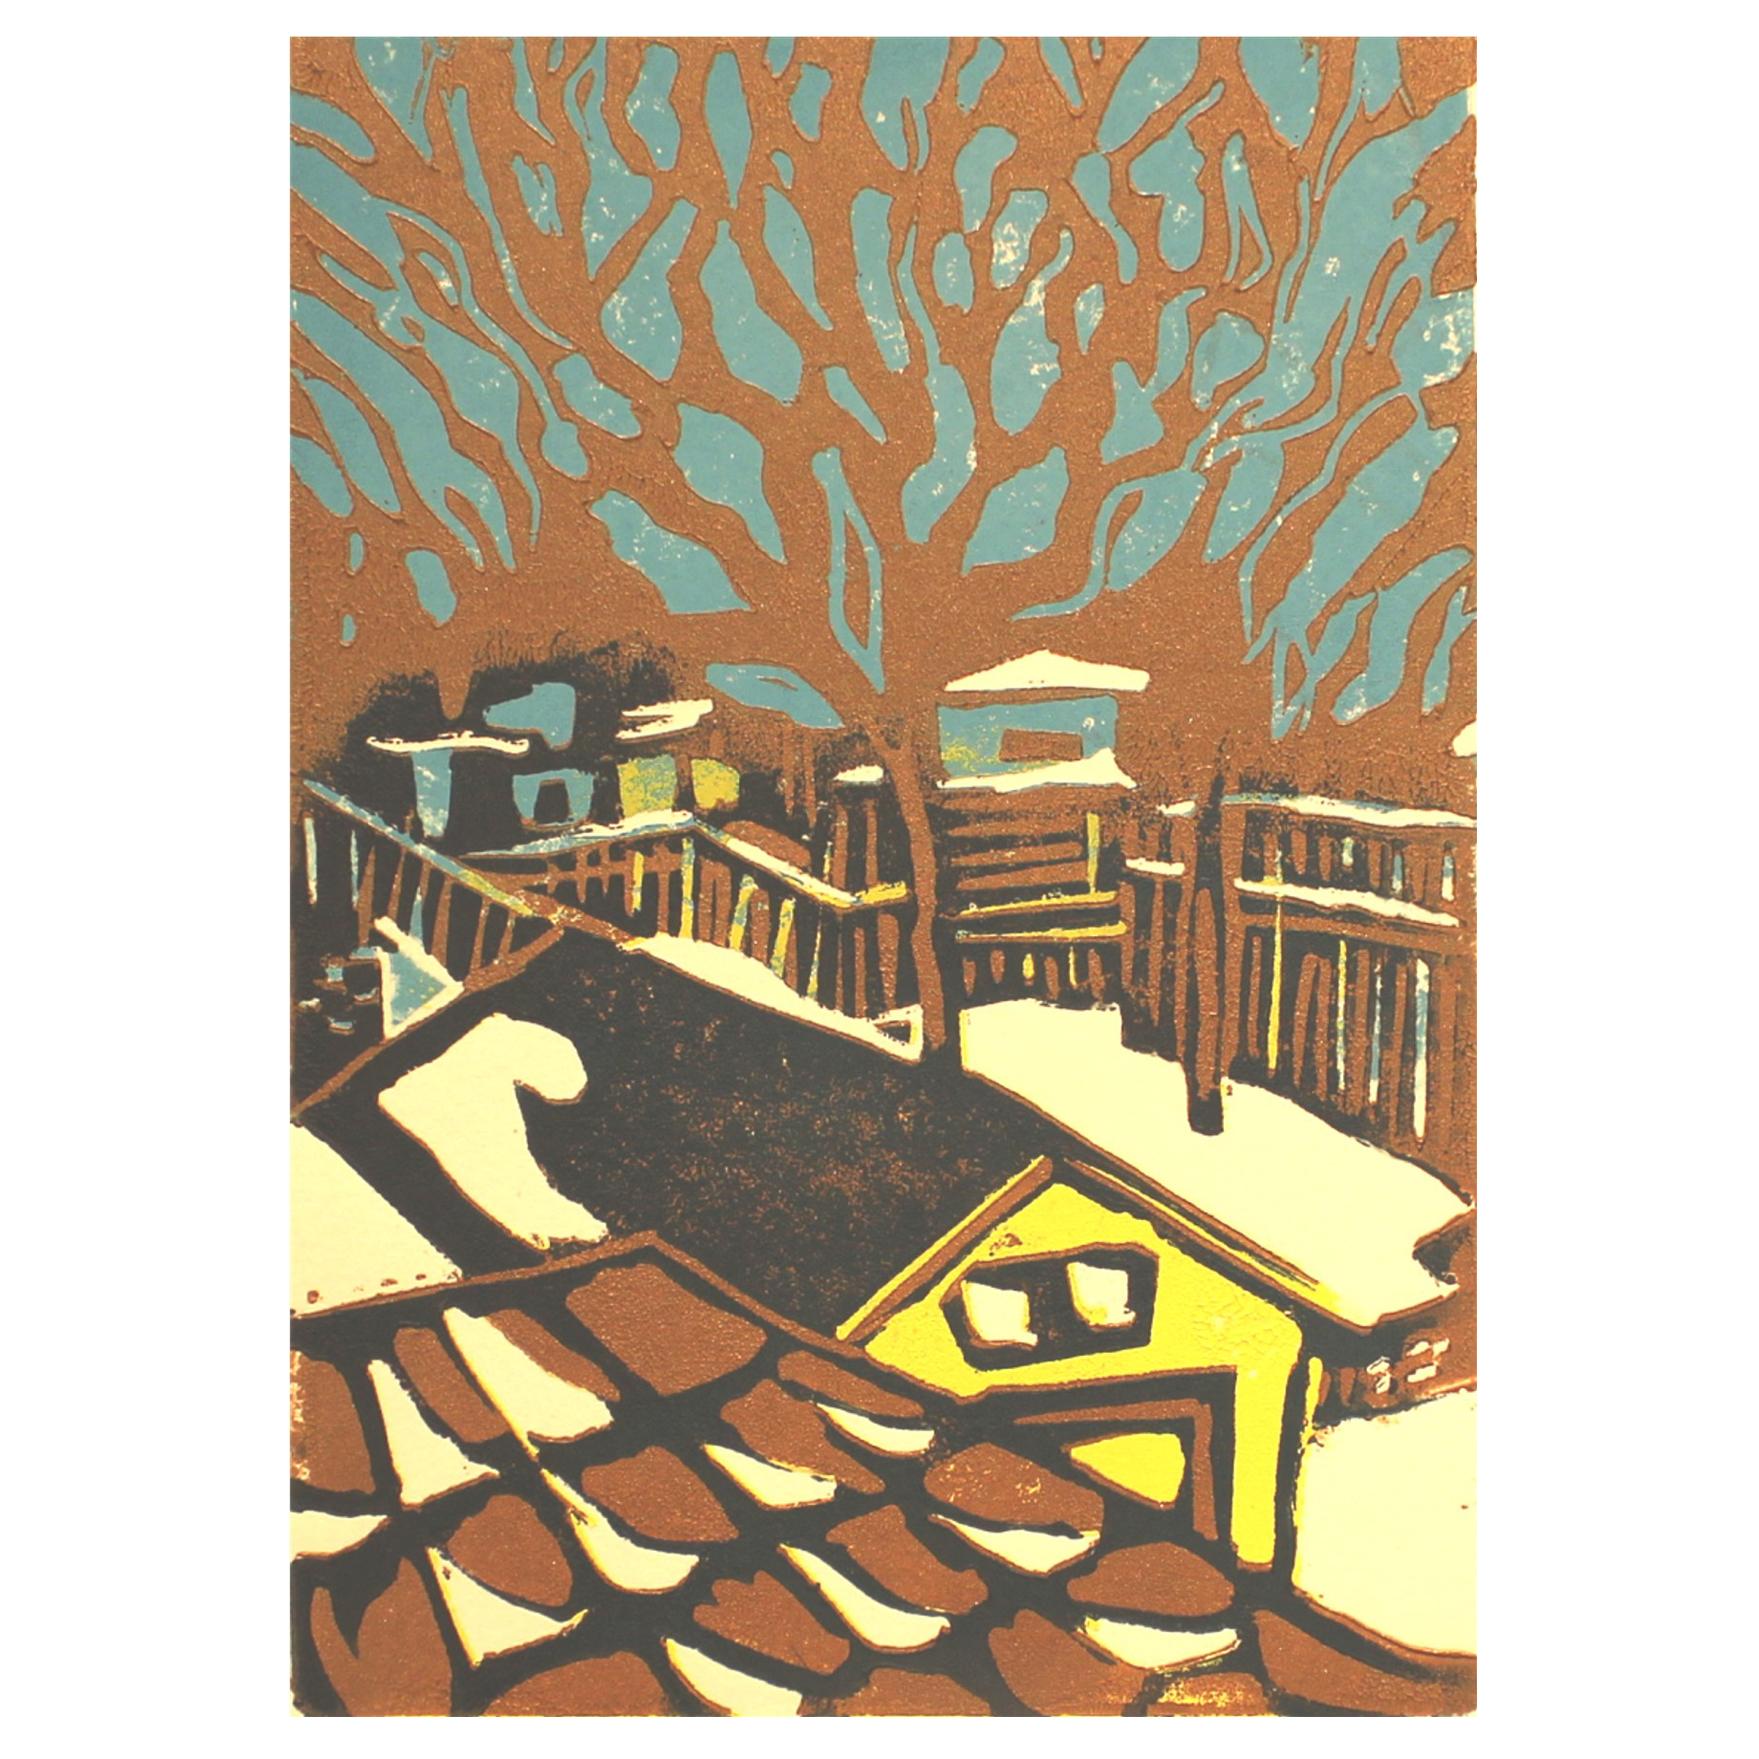 Brenda Fuhrman, Winter Yard, 2016, linocut